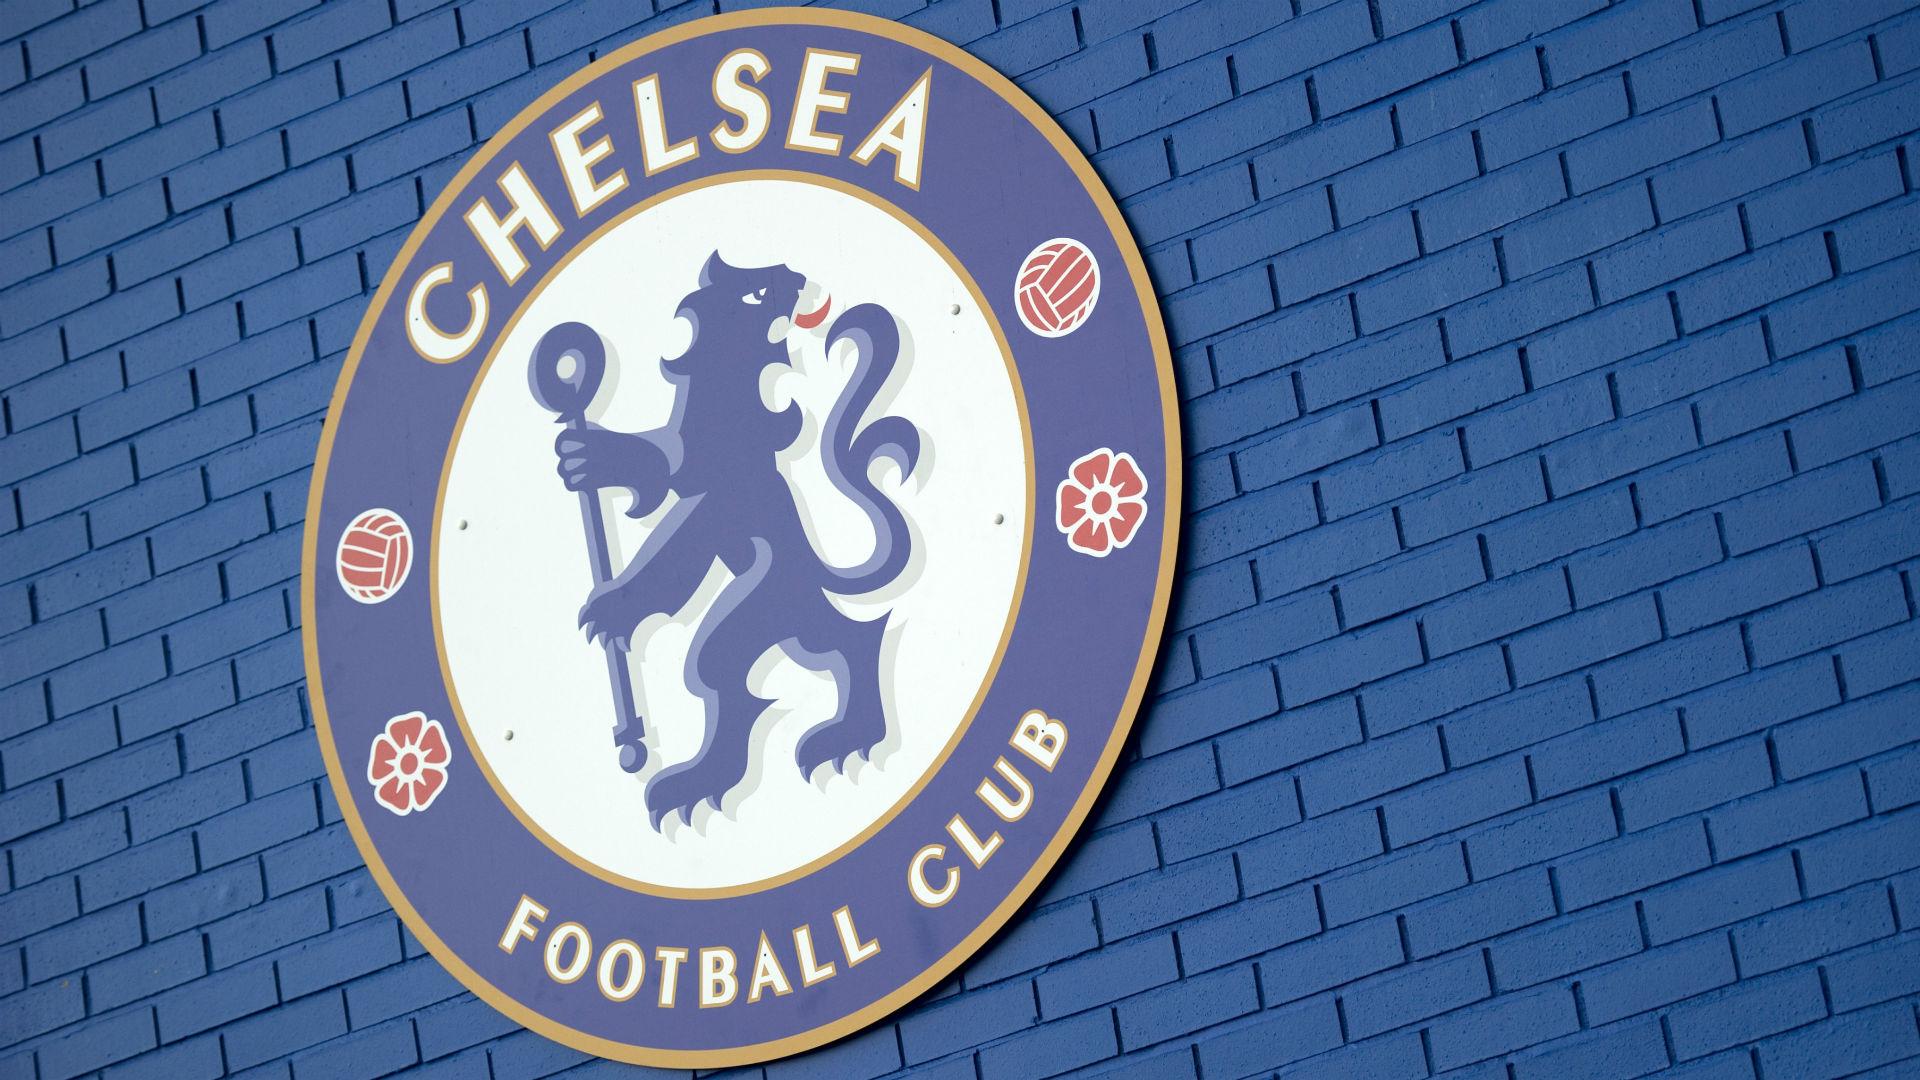 chelsea-football-0217-15-usnews-getty-ftr